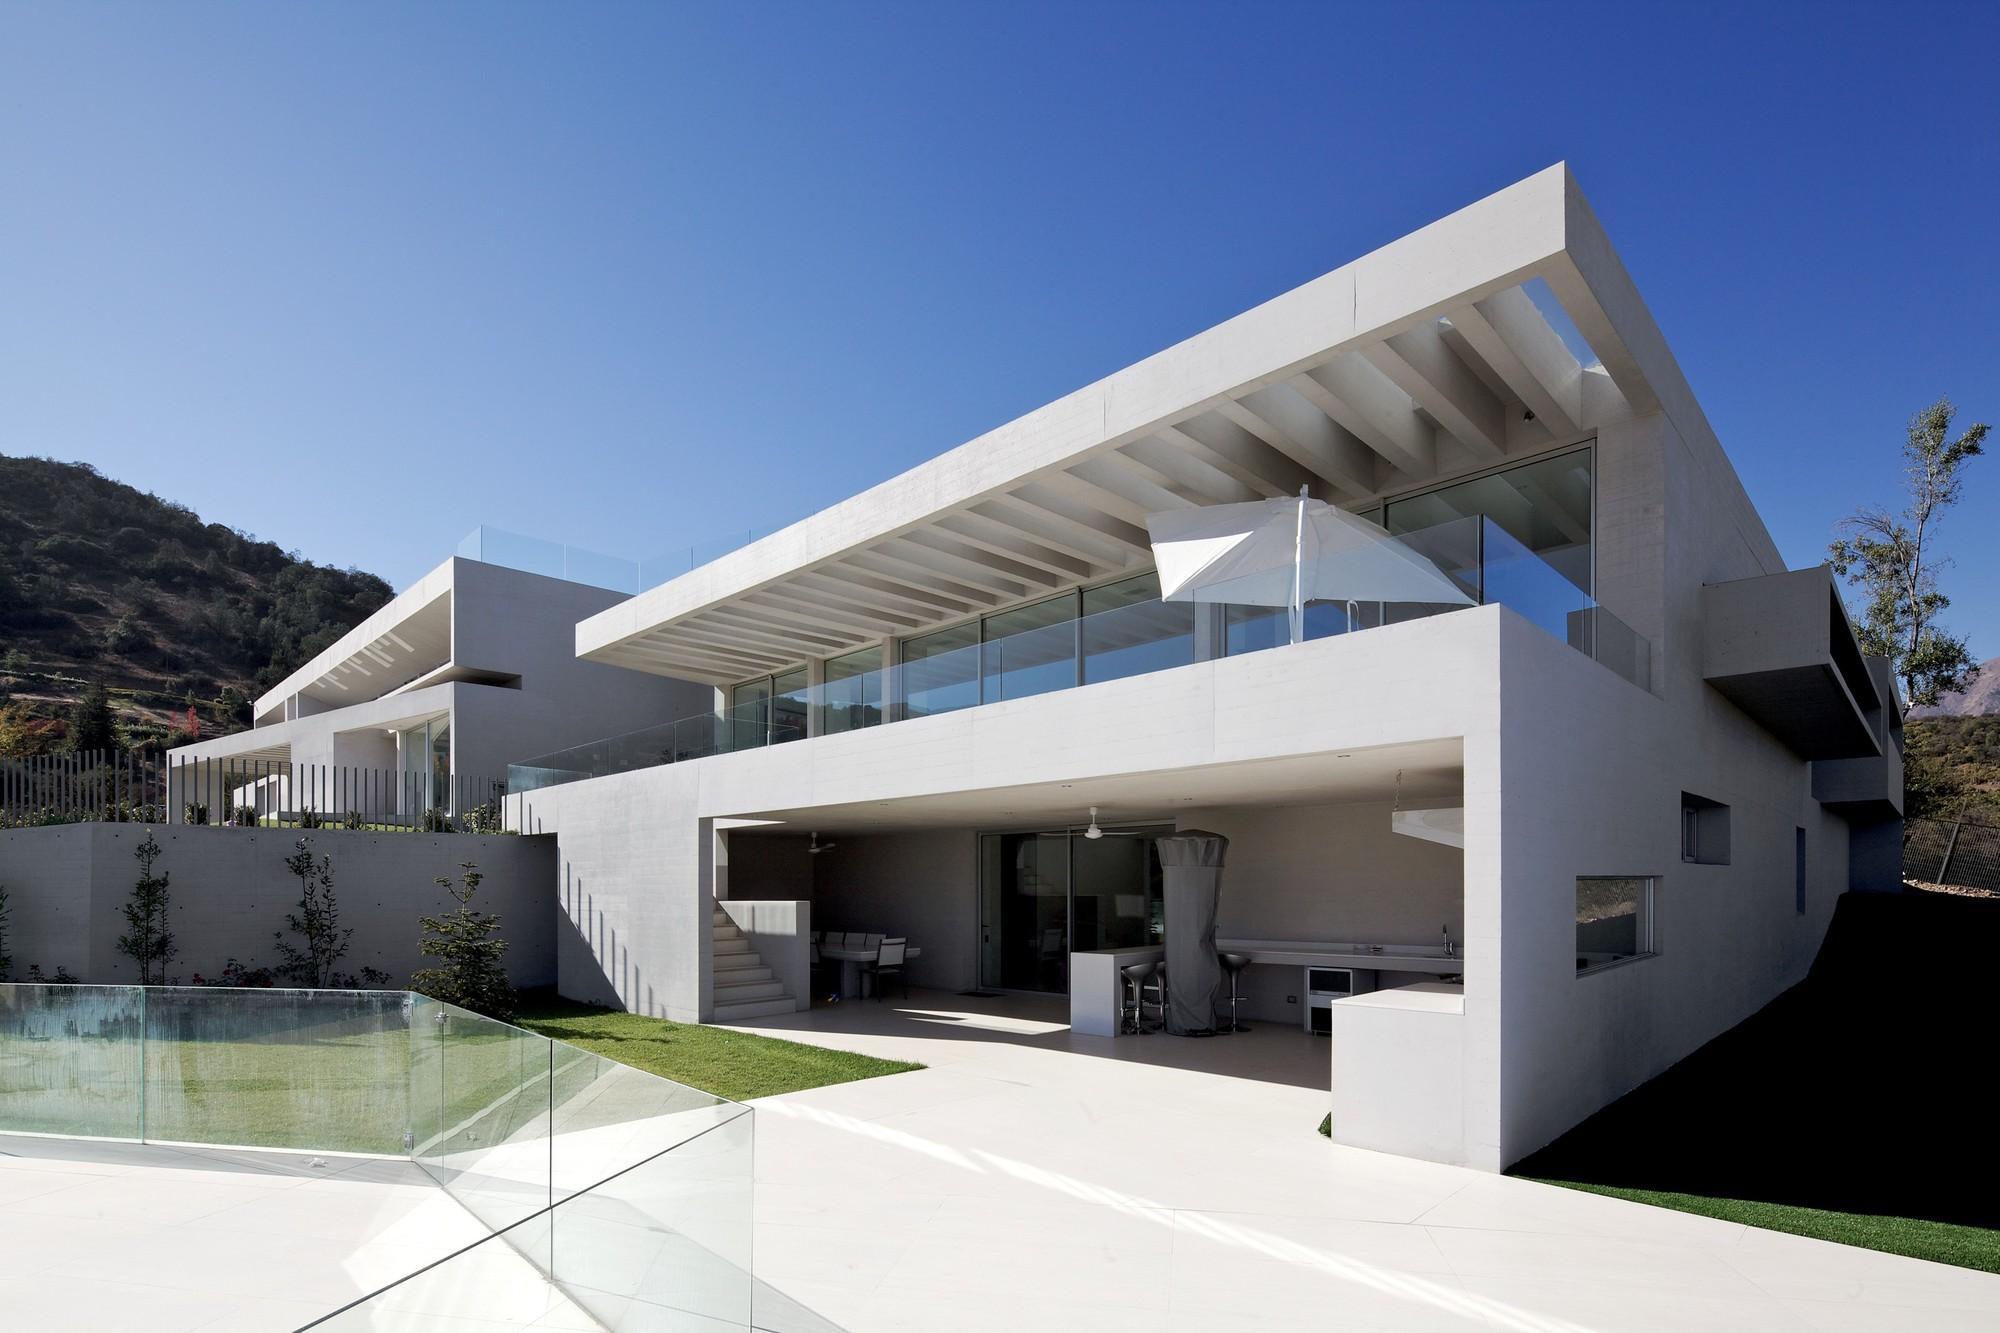 Gallery Of House Rp Marcelo Rios Gonzalo Mardones V